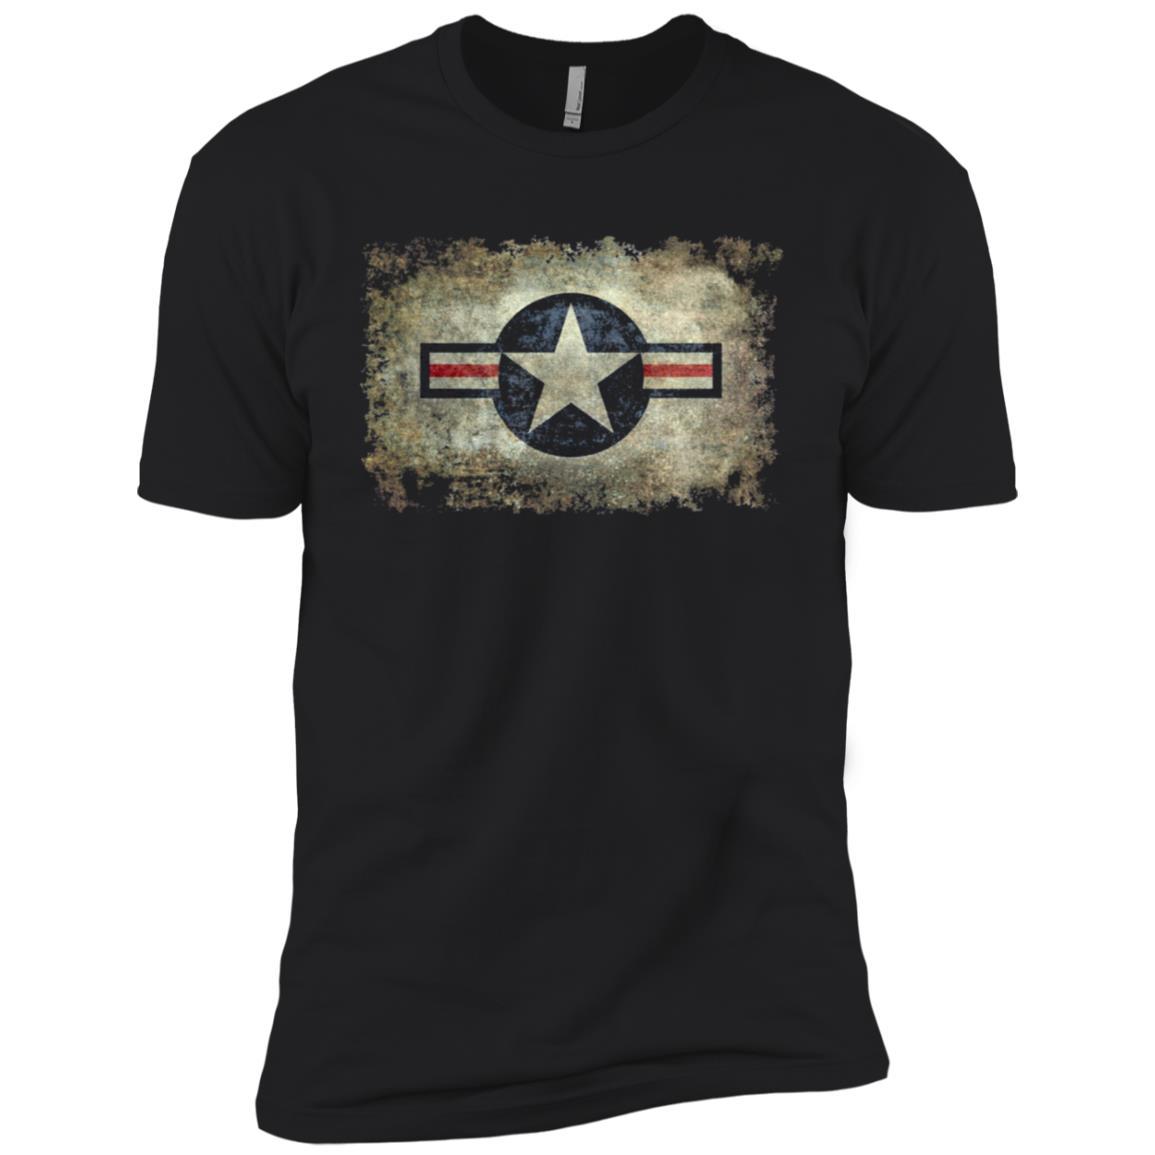 Vintage Retro Style Star Air Force Roundel Symbol Men Short Sleeve T-Shirt